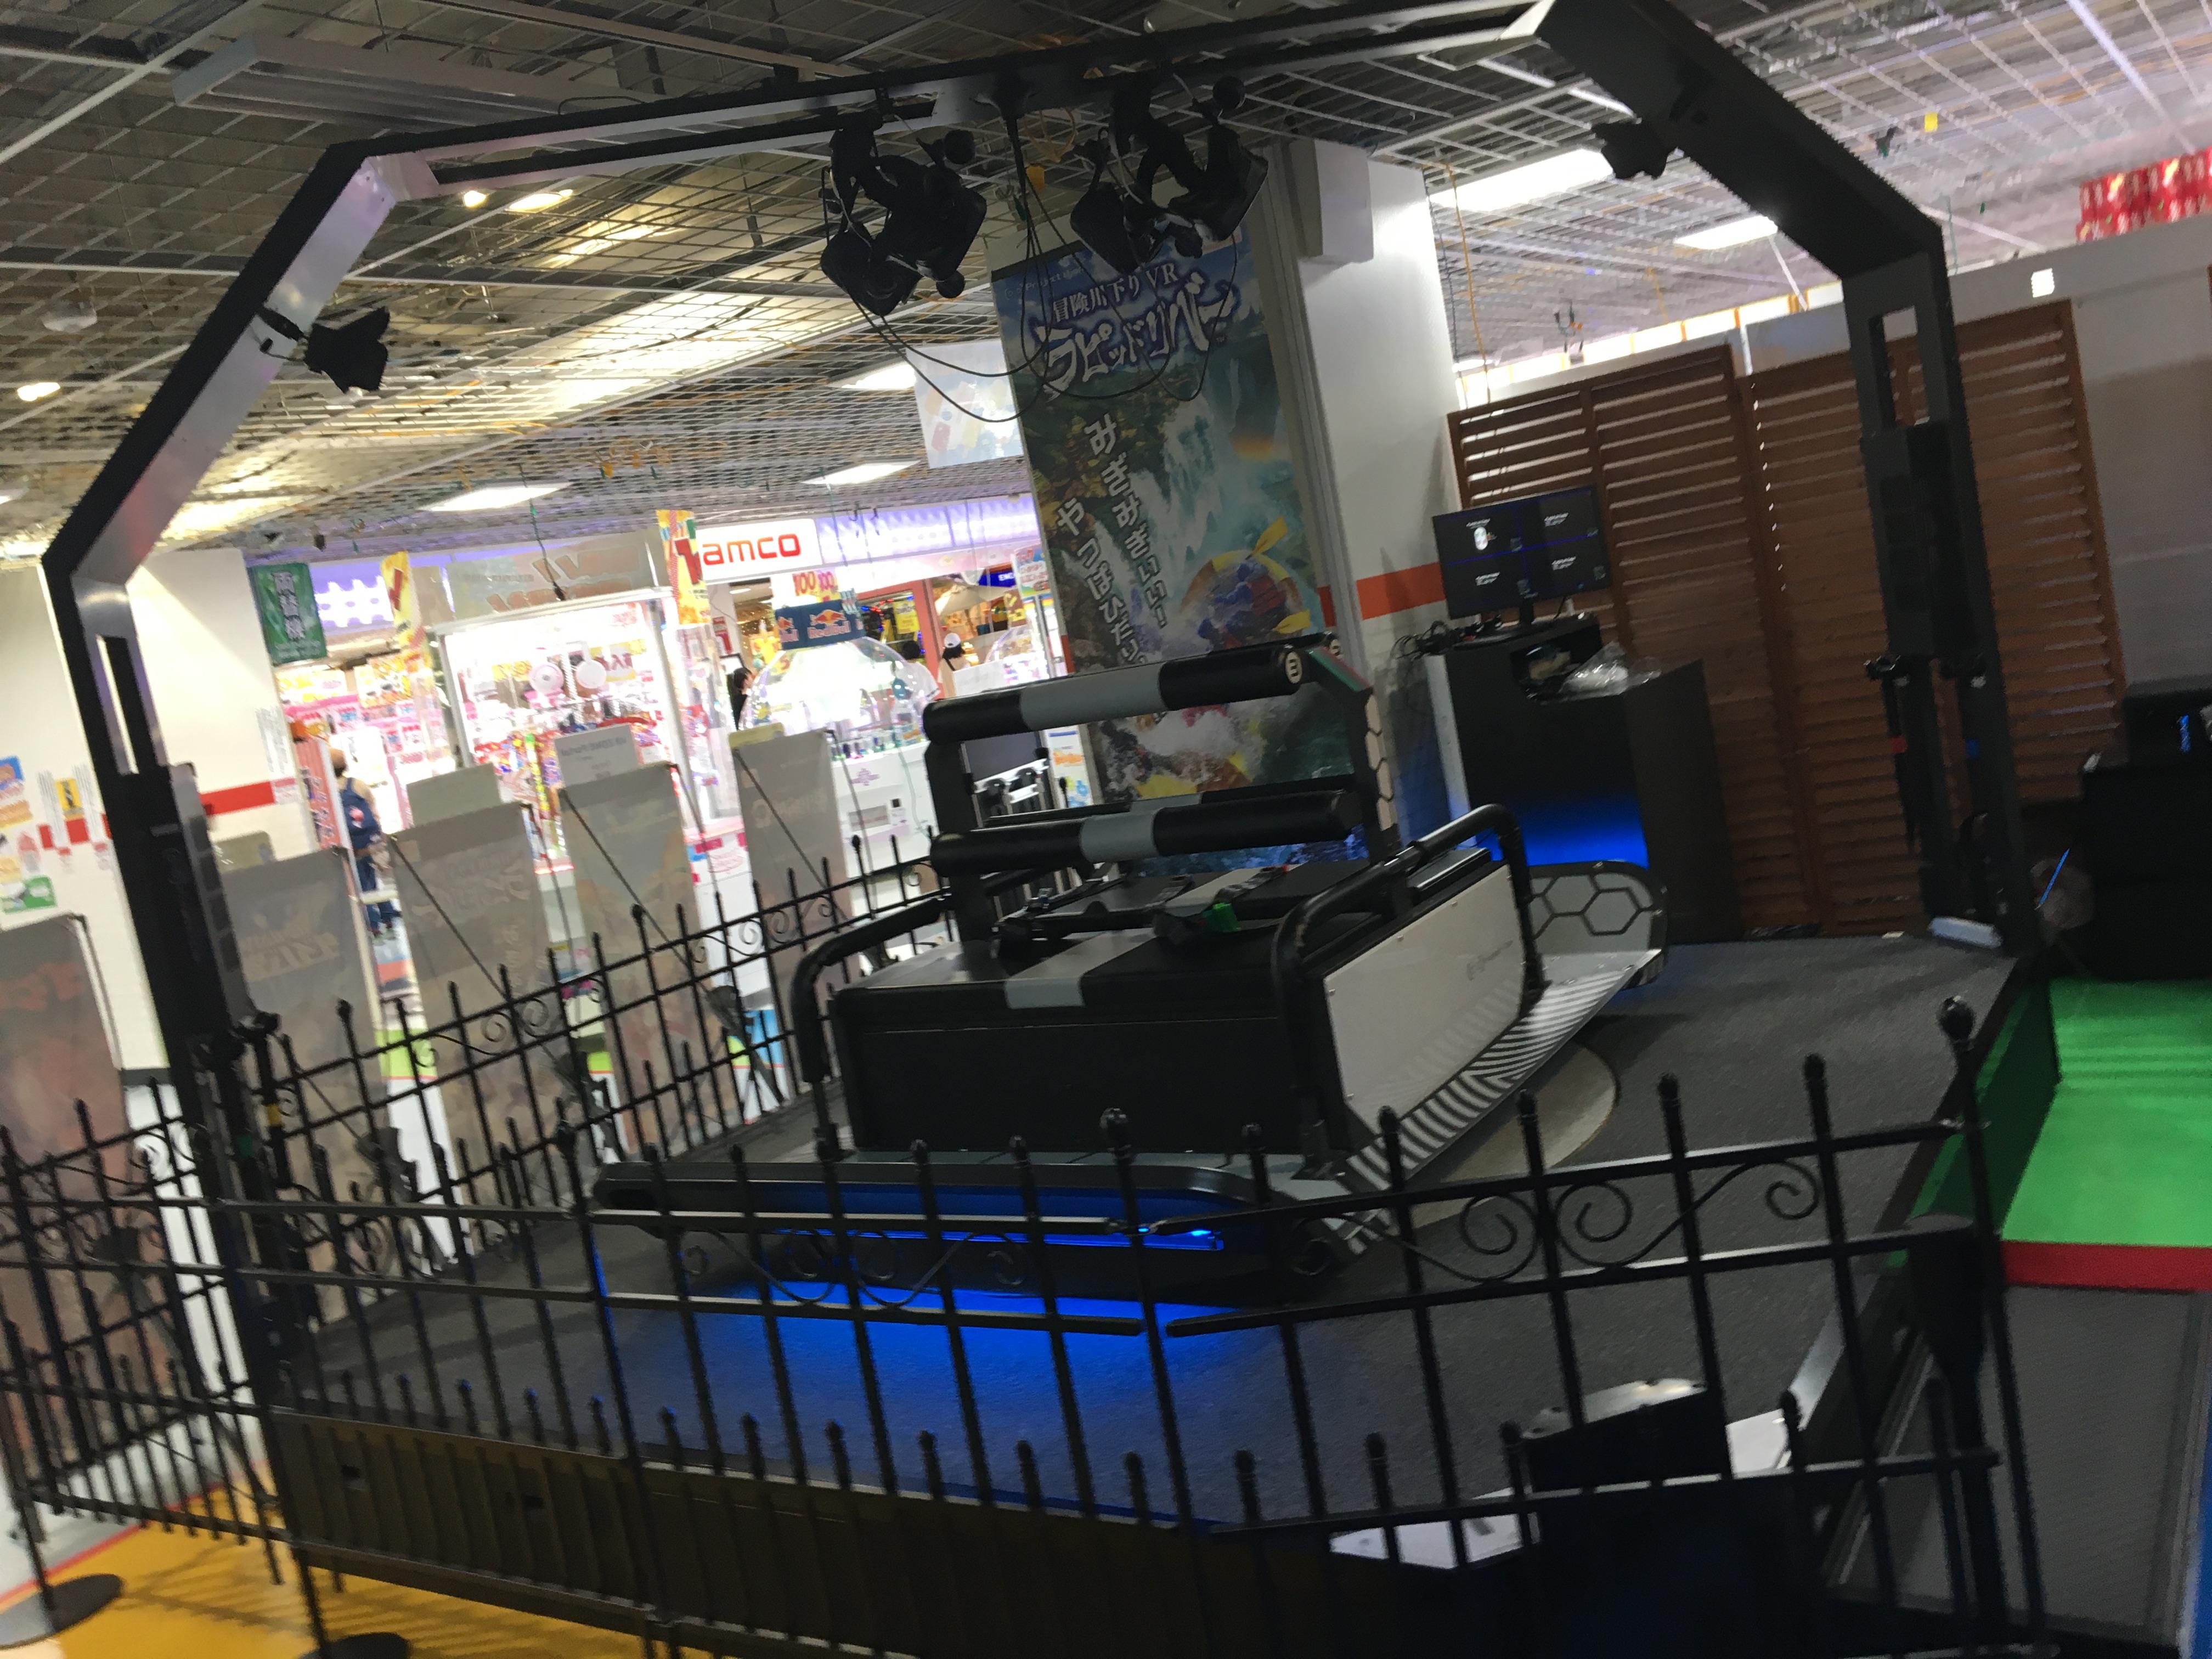 『VR ZONE Portal』namco札幌エスタ店で体験できるラピッドリバーの筐体